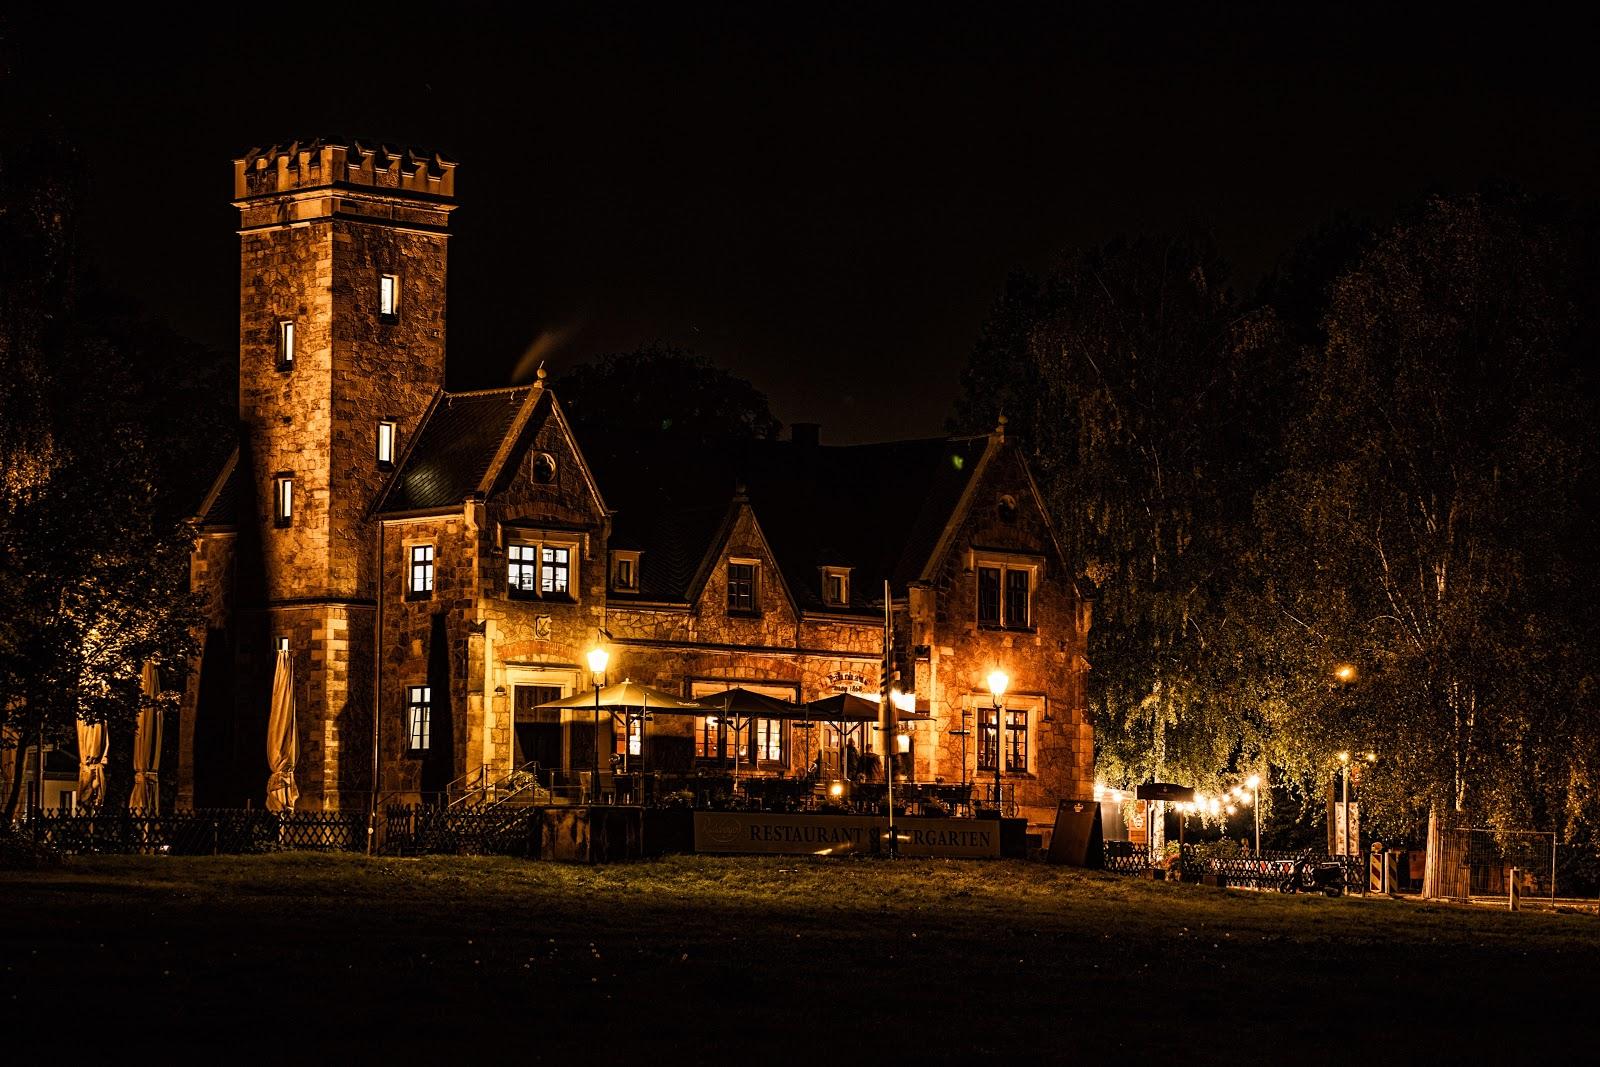 lit castle at night